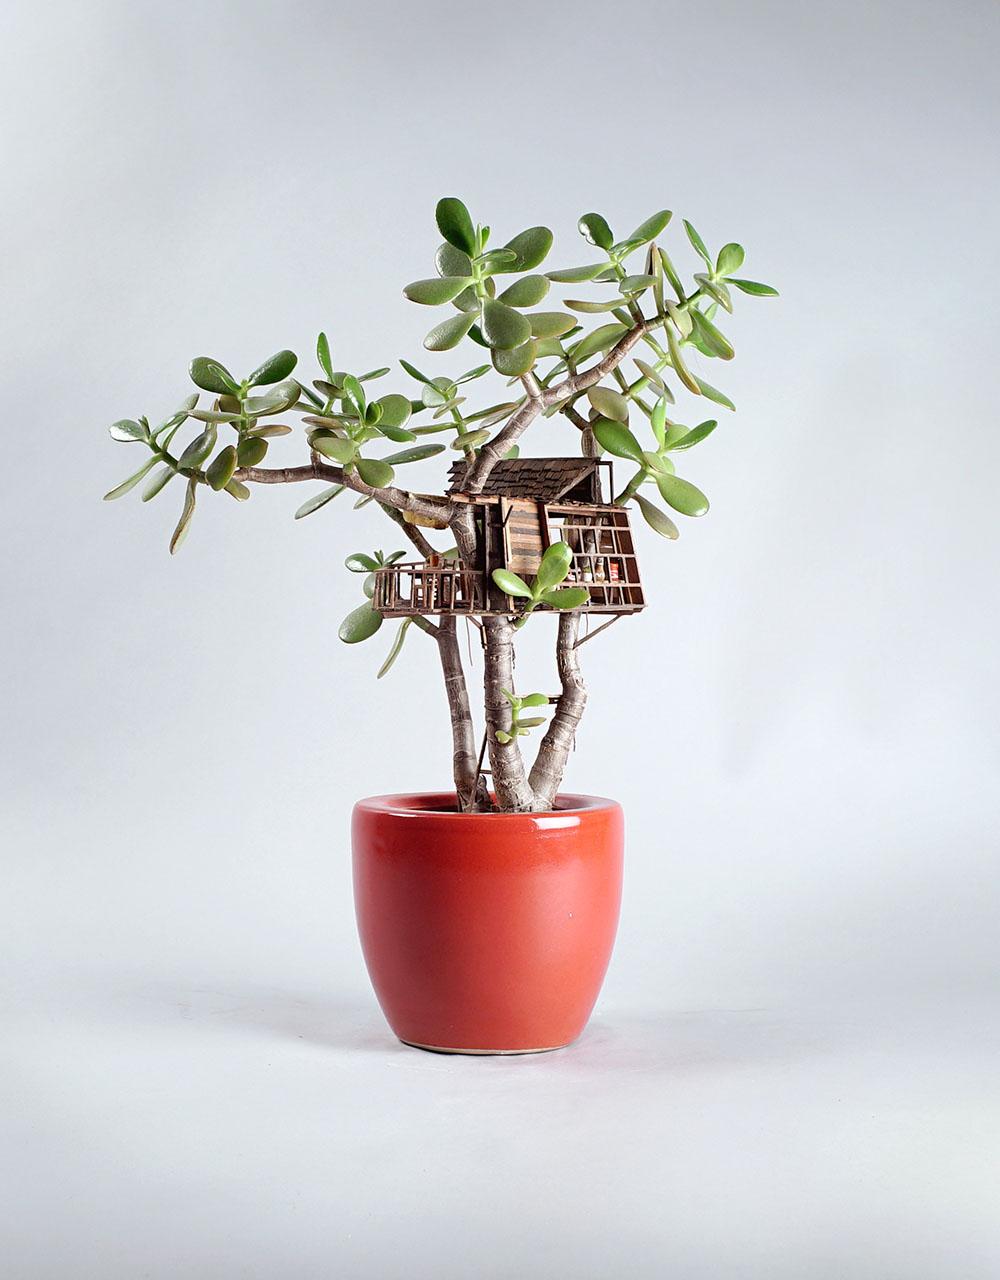 case-su-albero-miniatura-jedediah-corwyn-voltz-3